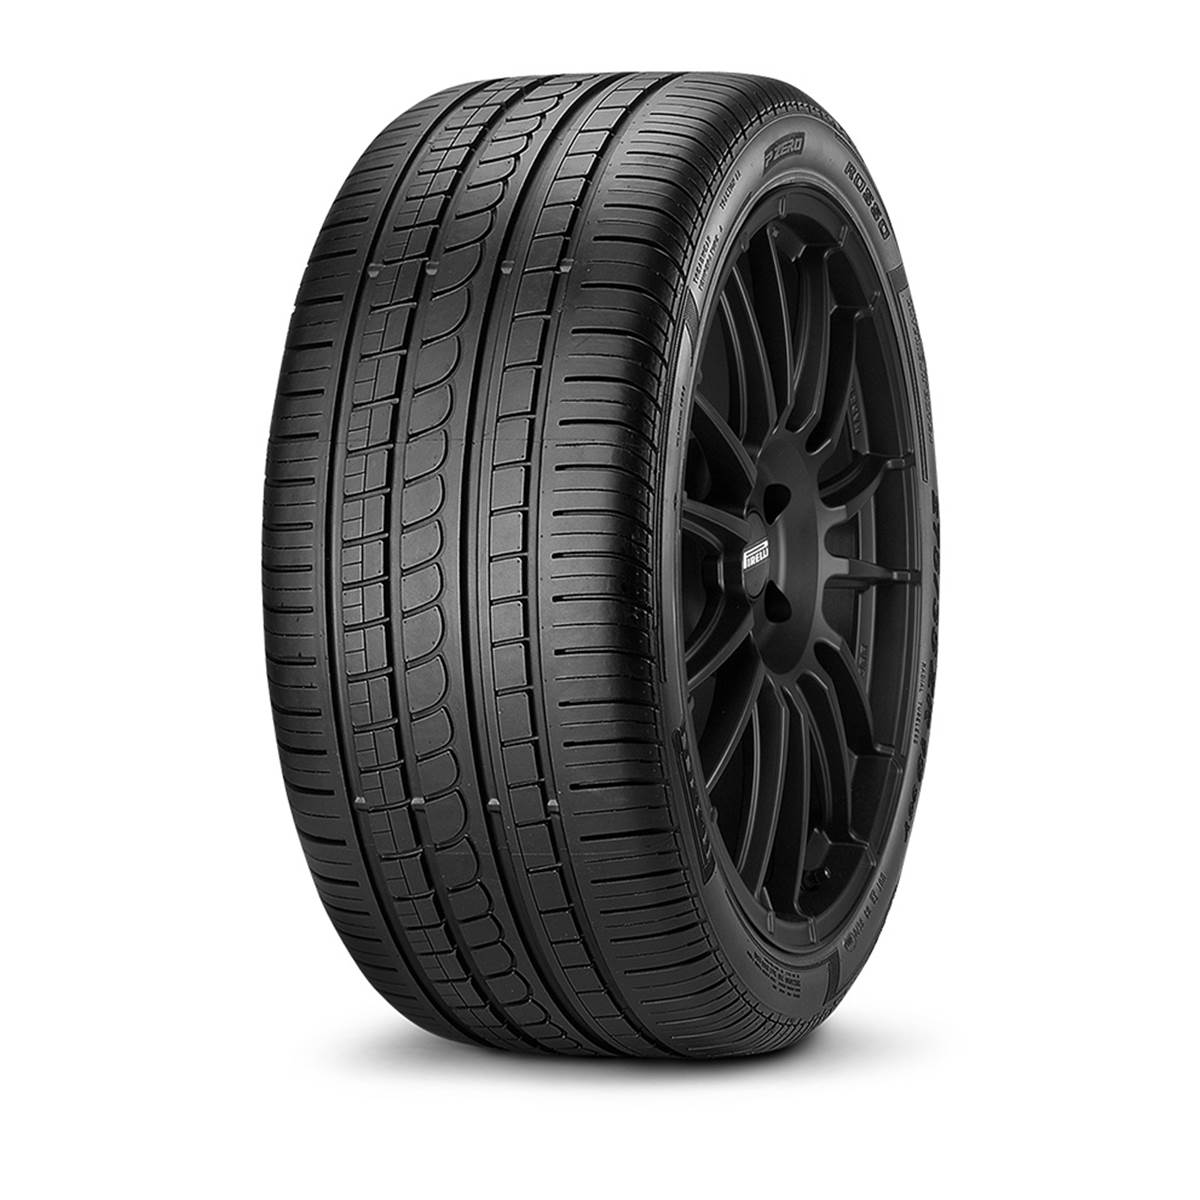 Pneu Pirelli 245/30R20 90Y Pzero Nero (Gt) XL